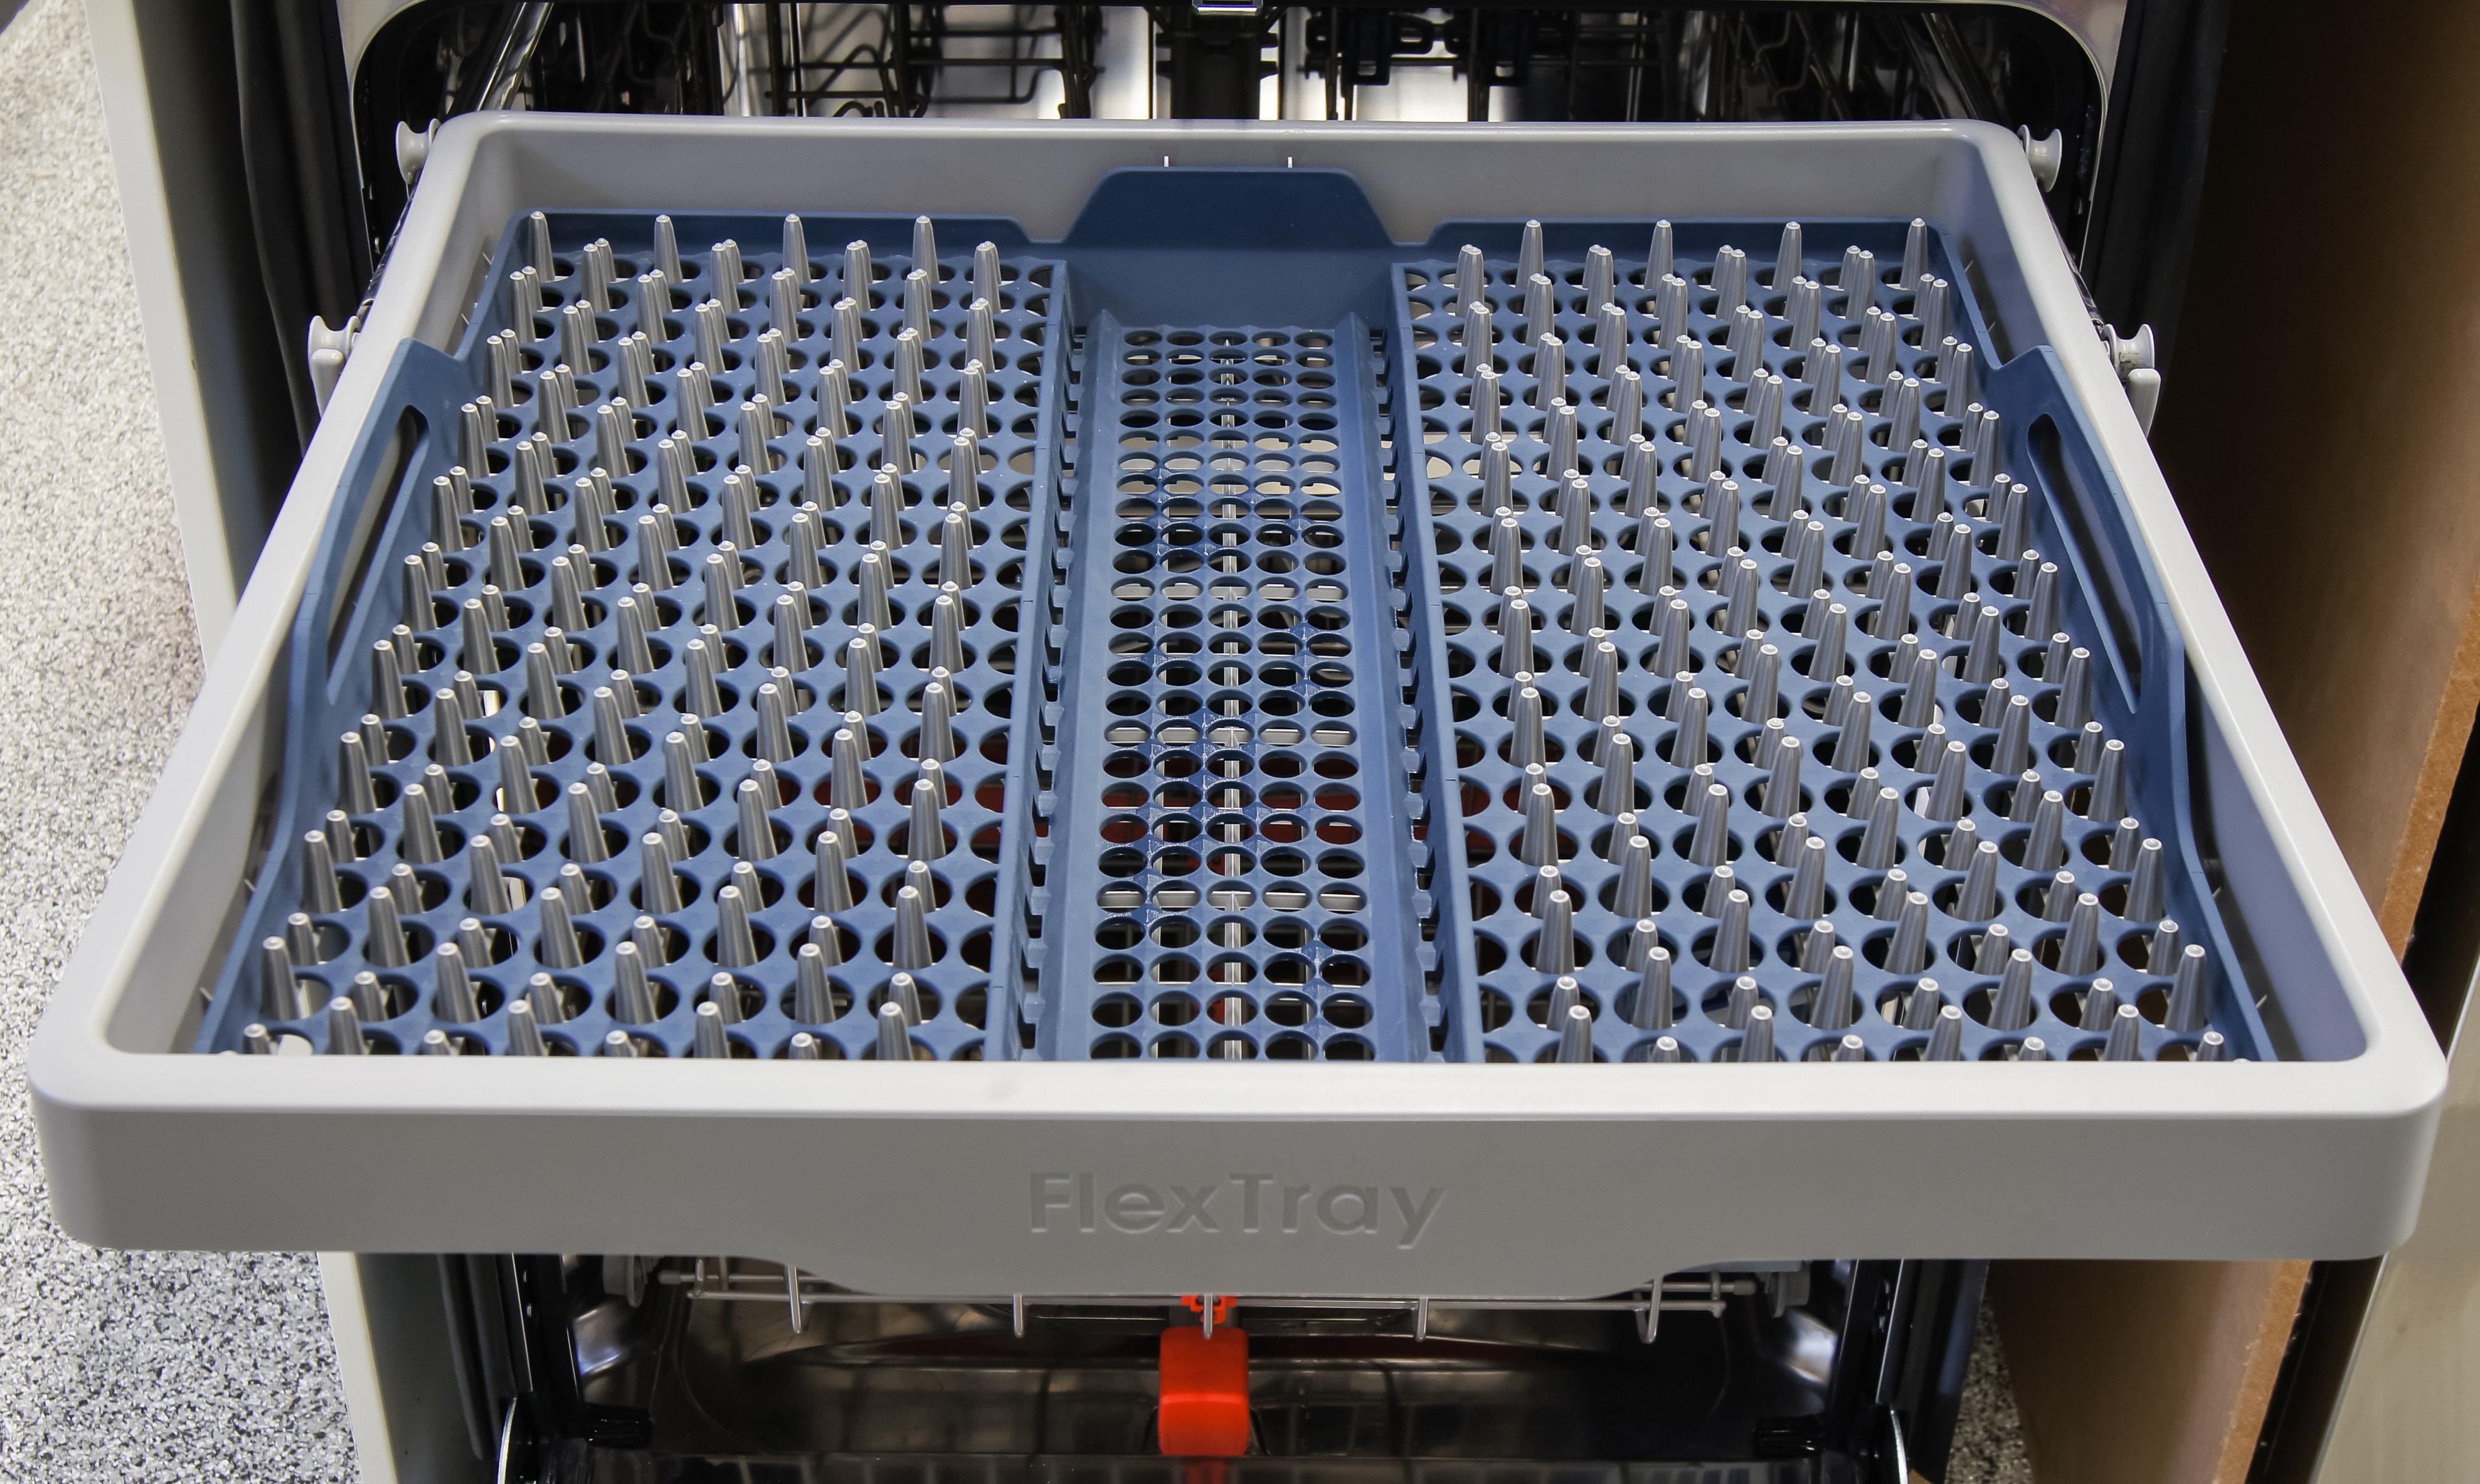 Samsung DW80H9930US third rack Flextray